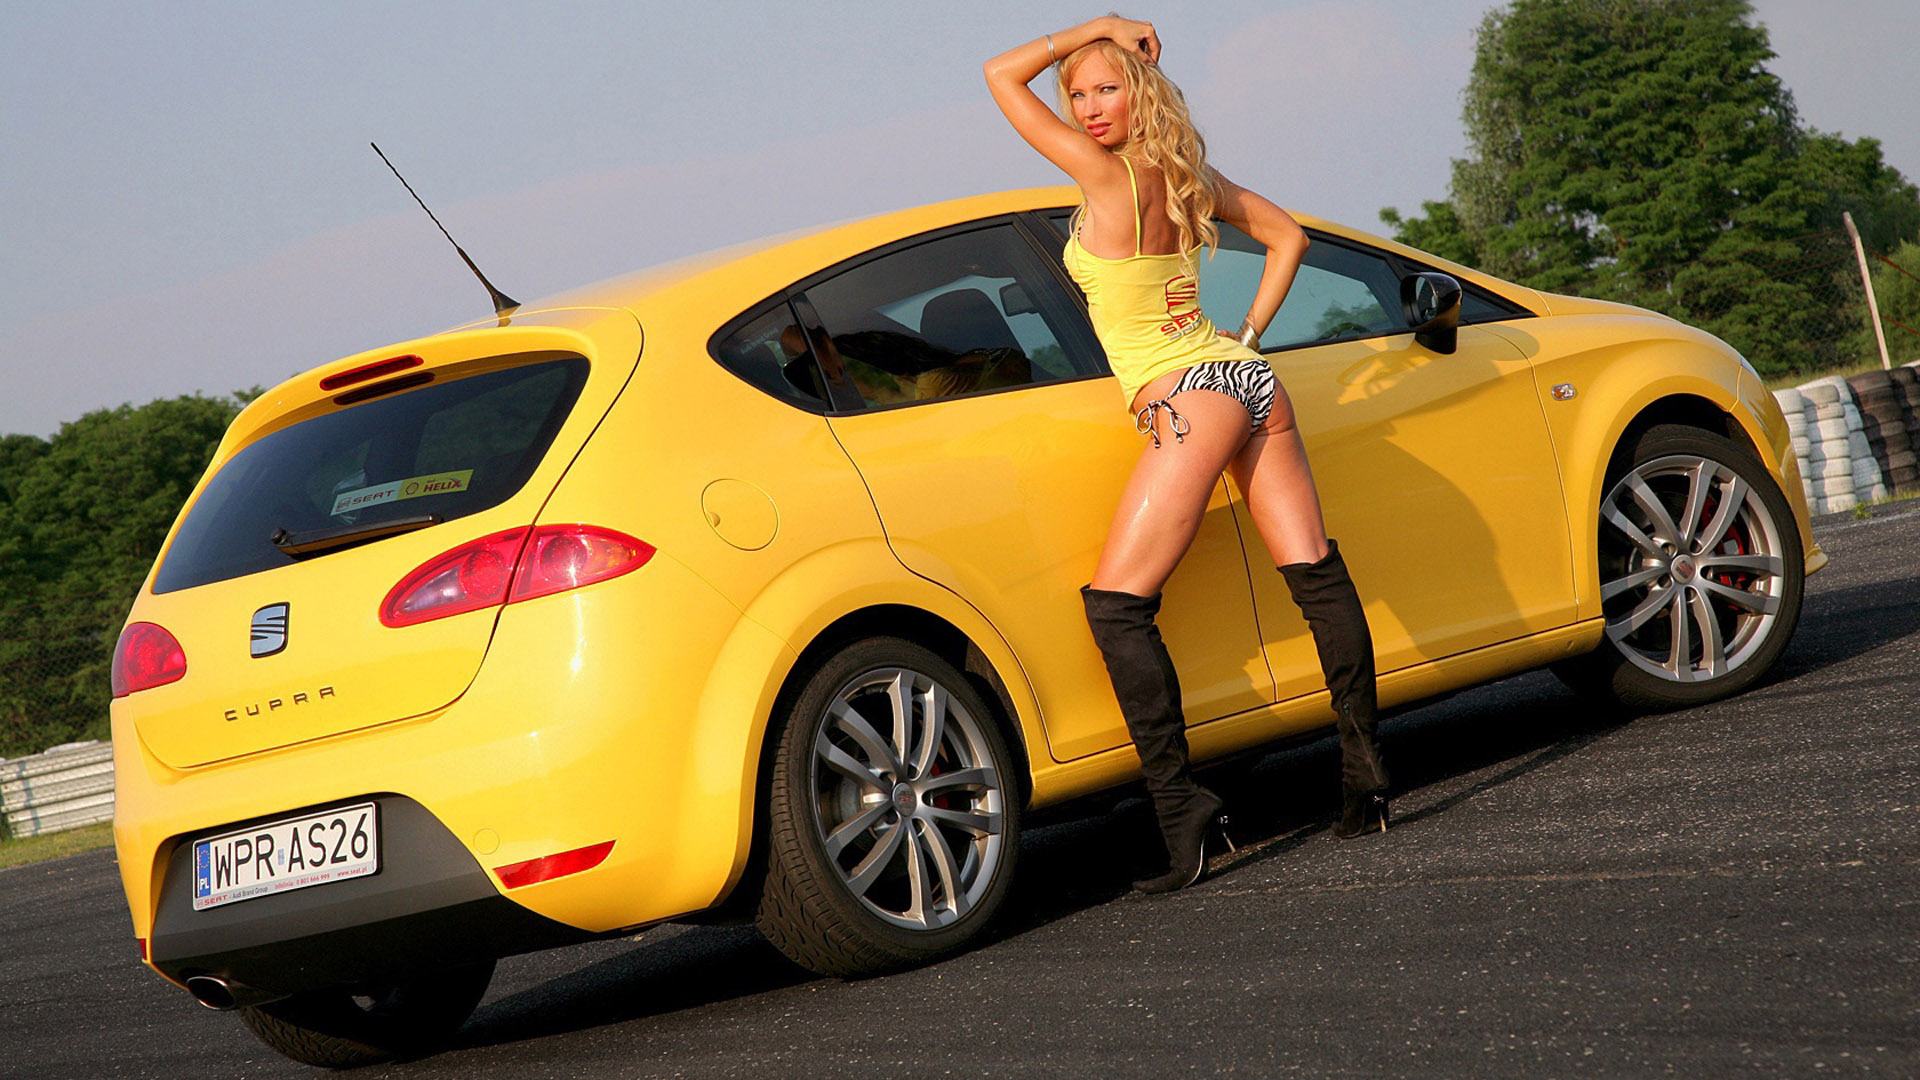 стал три девушки возле желтой машины картинки аккуратно